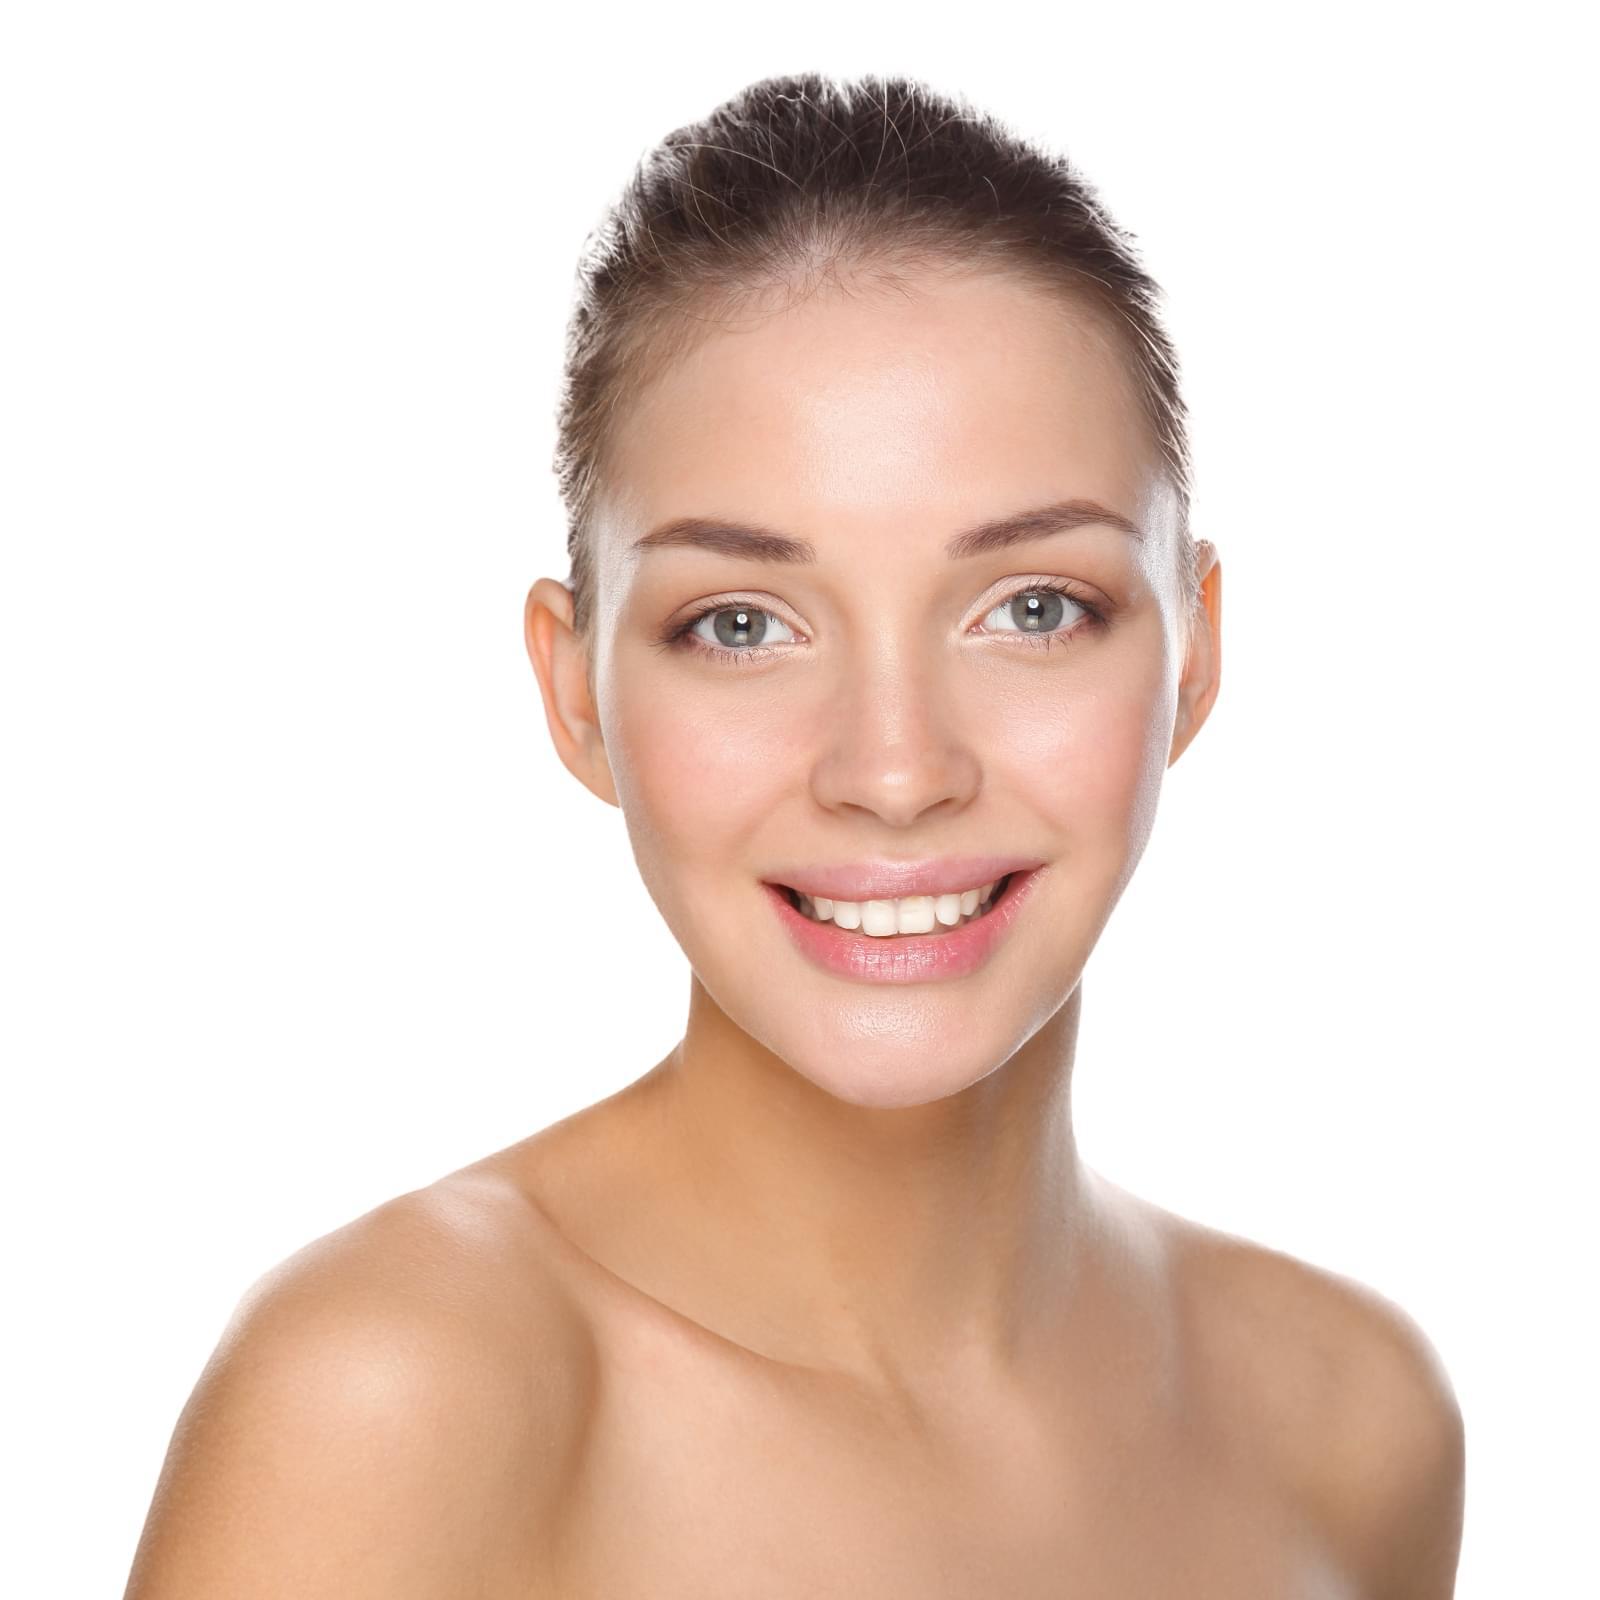 Blepharoplasty (Upper and Lower Eyelids)